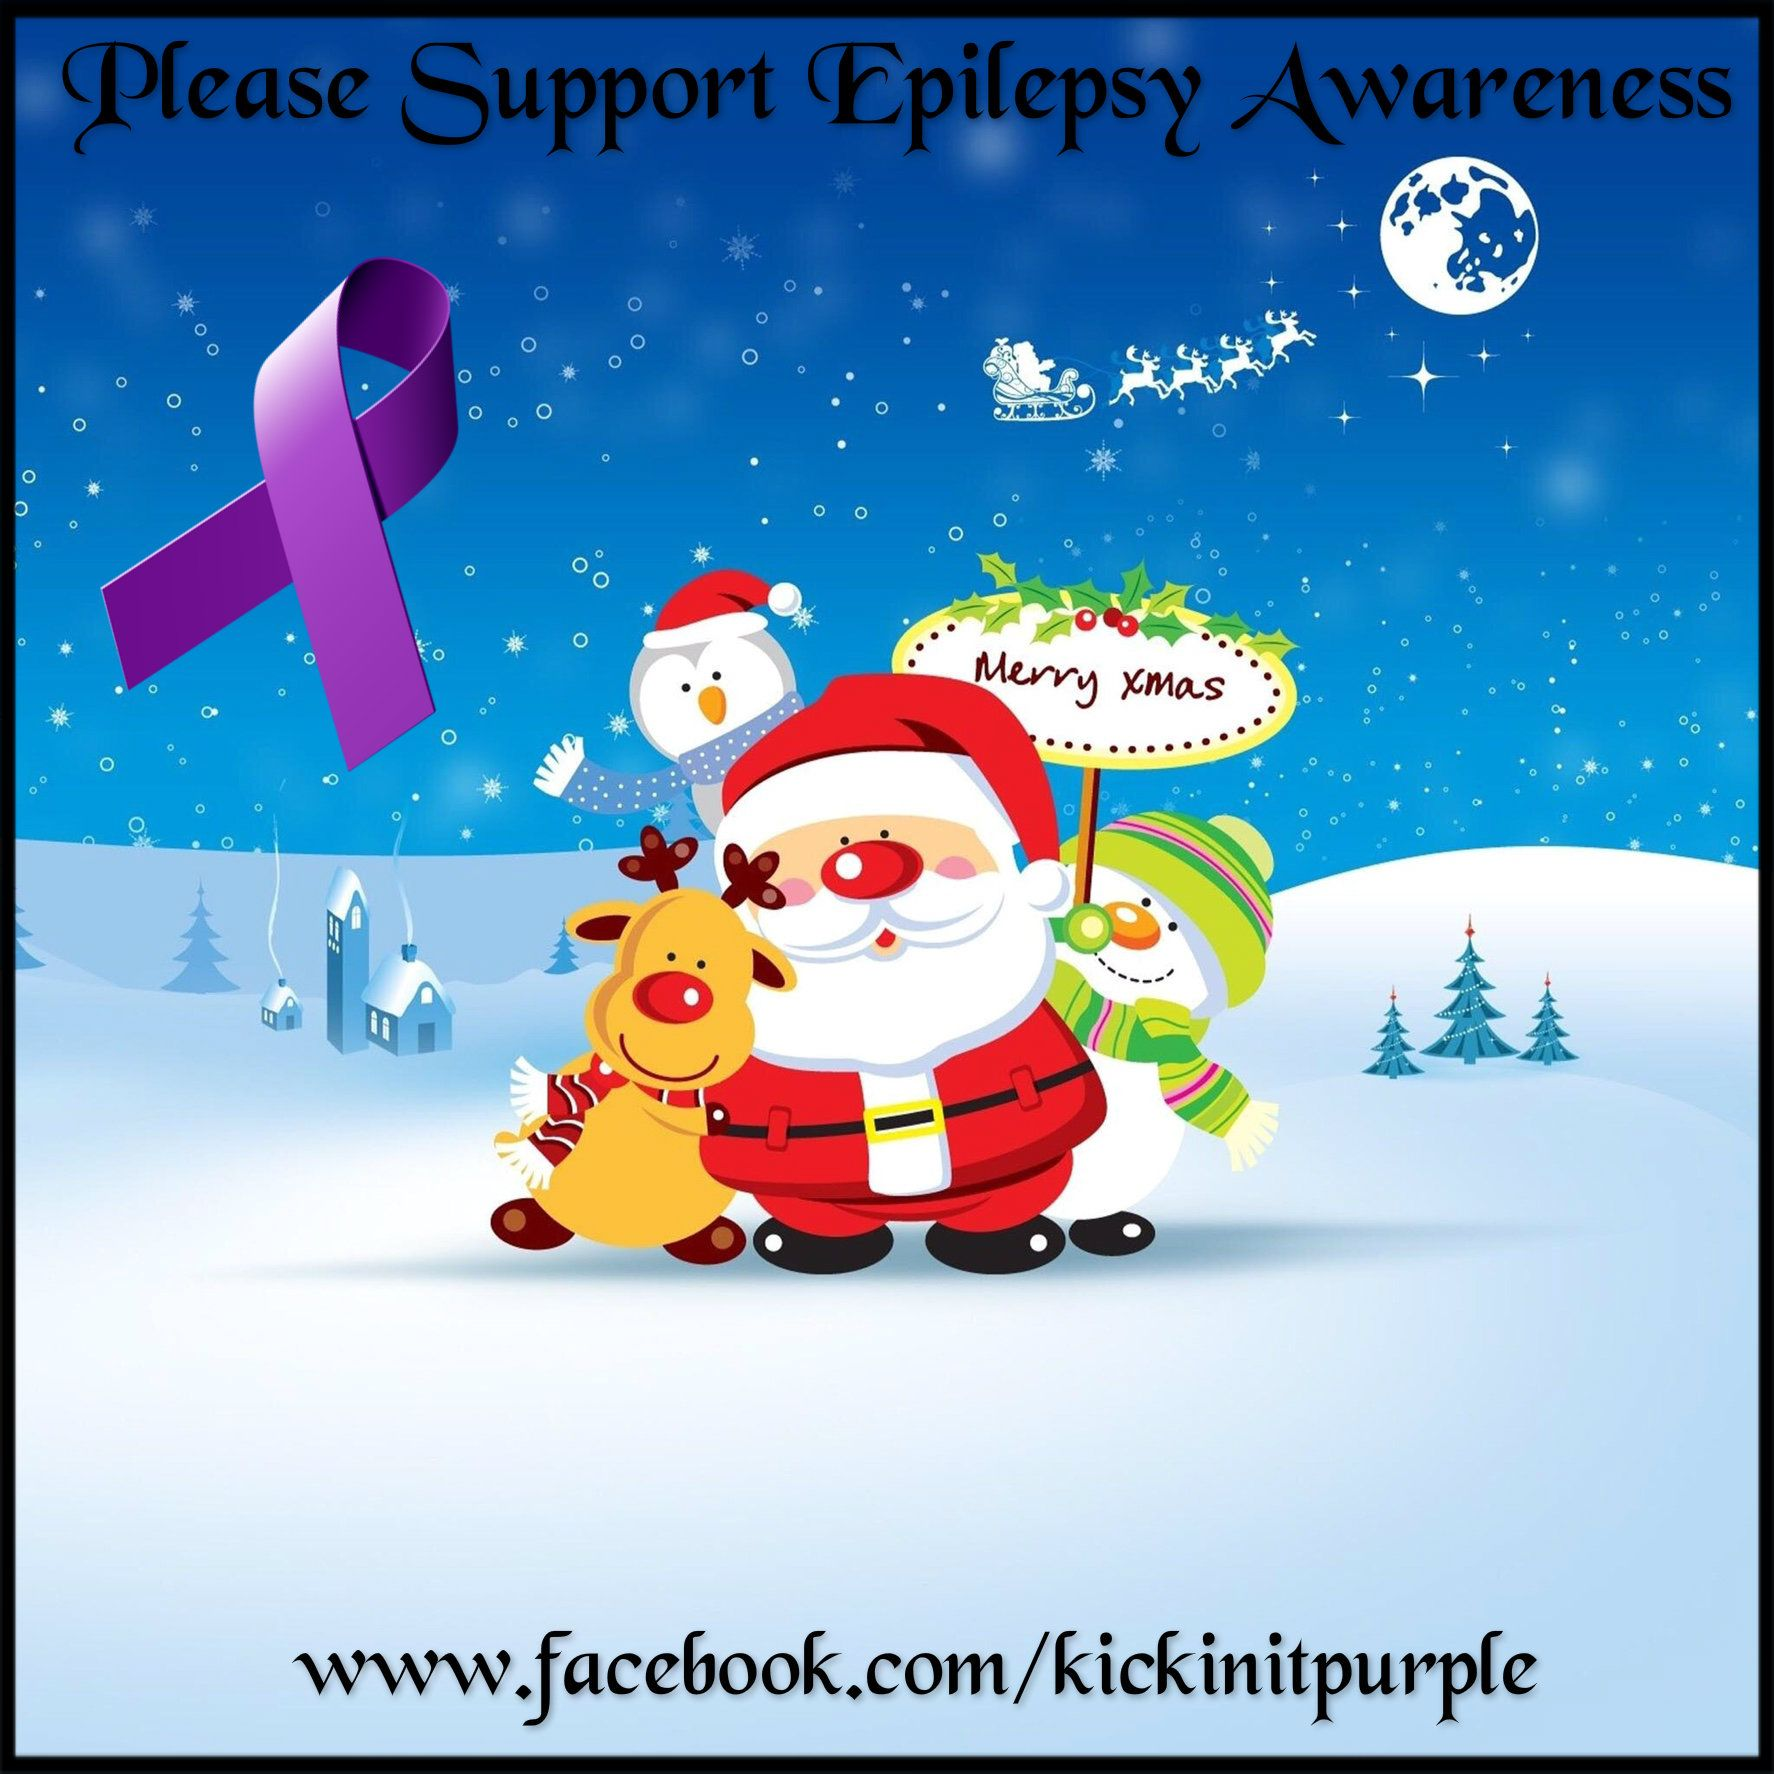 epilepsyawareness #epilepsysupport #epilepsy | kickin it purple